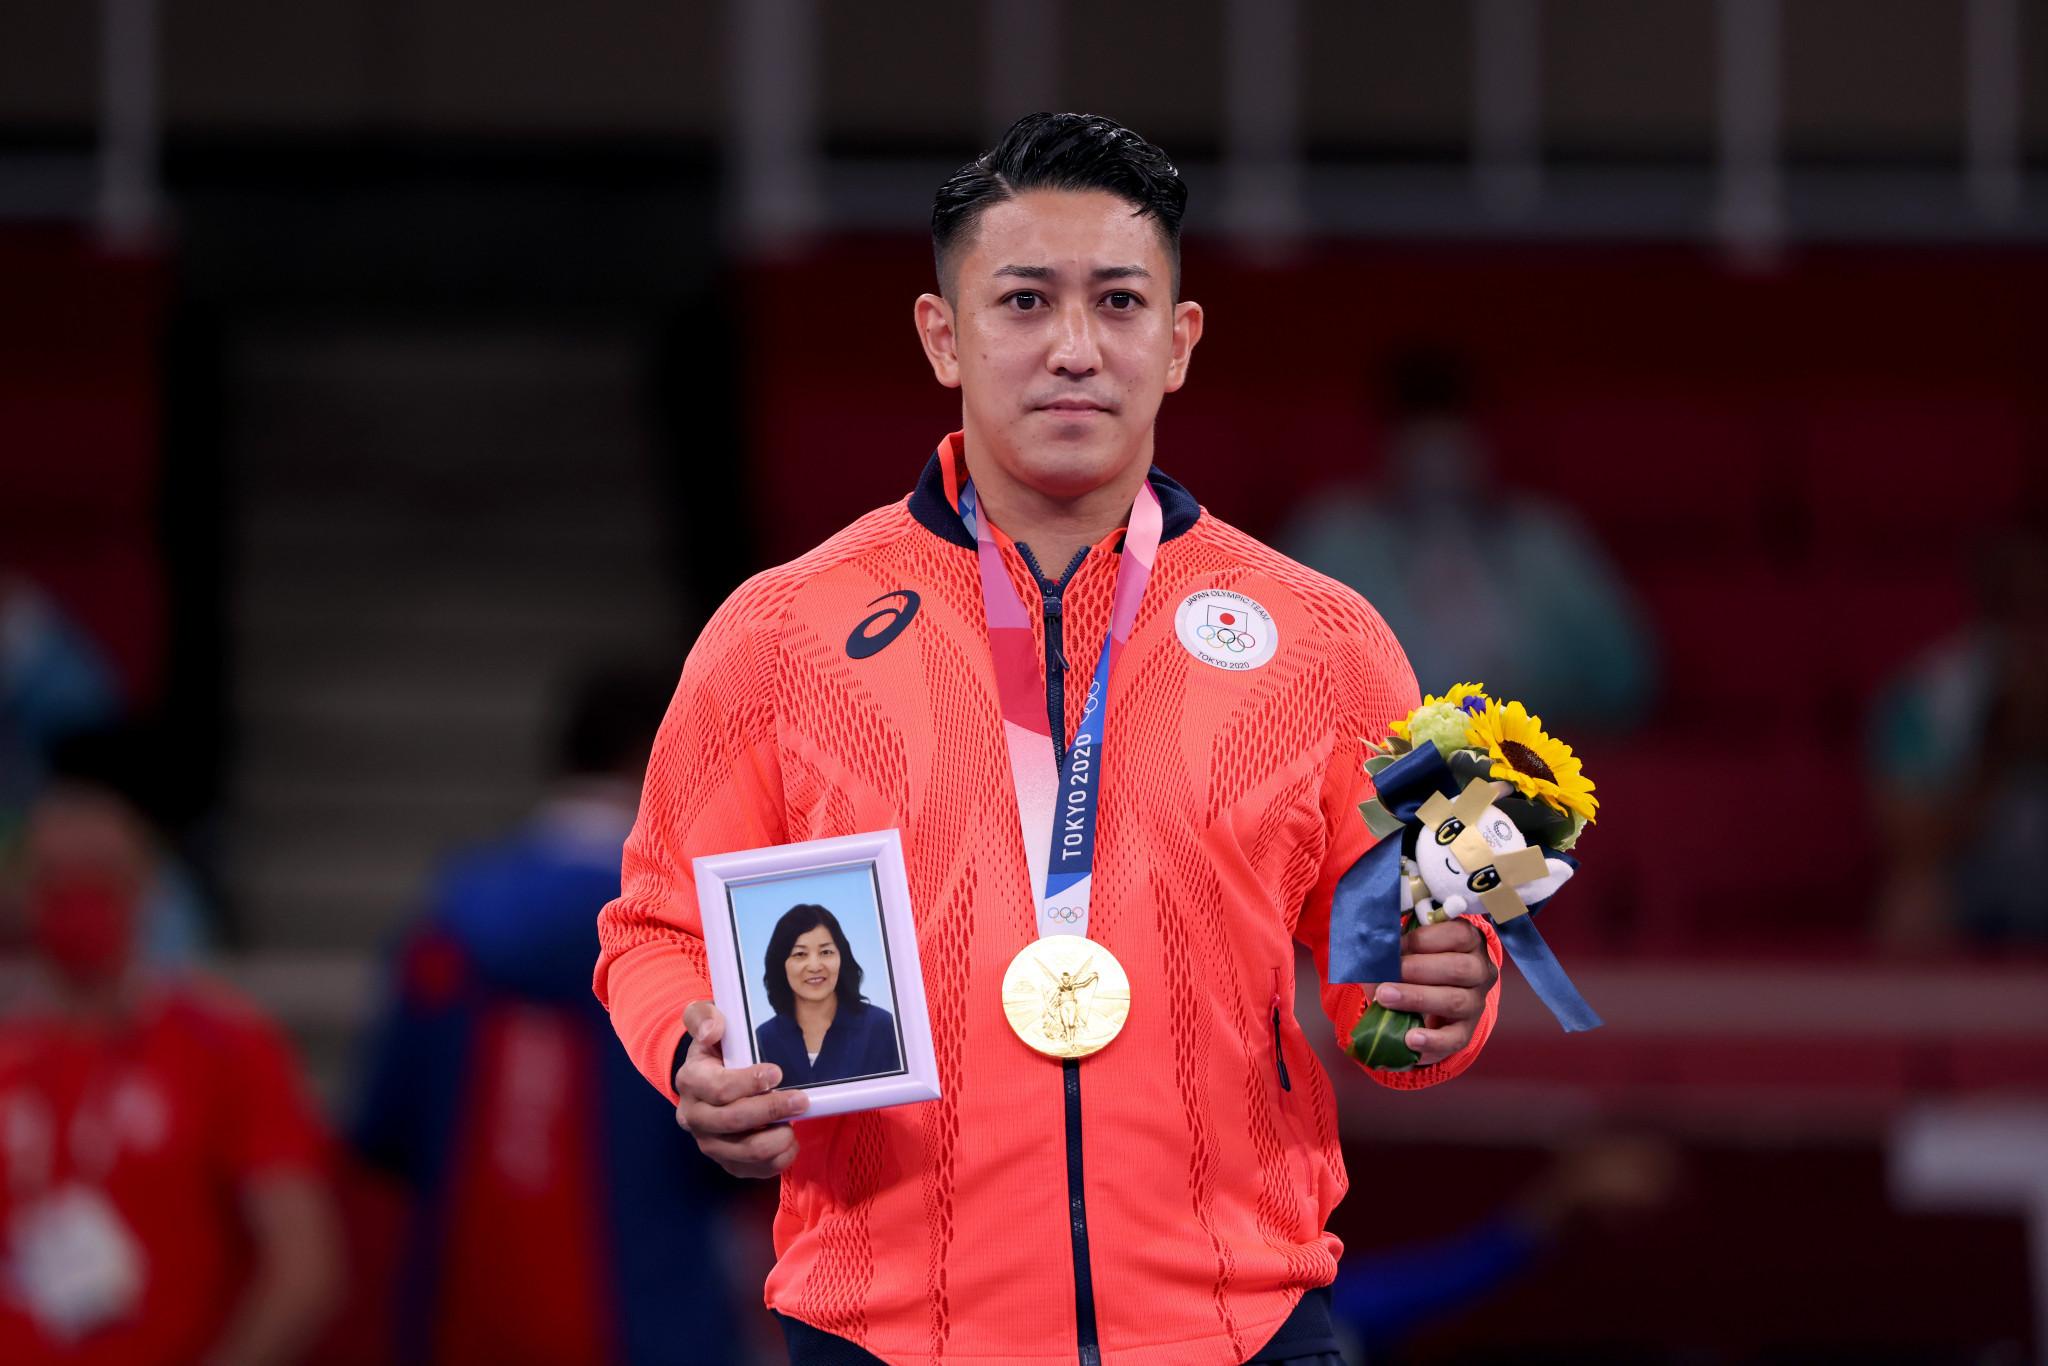 World champion Kiyuna wins first men's Olympic kata title